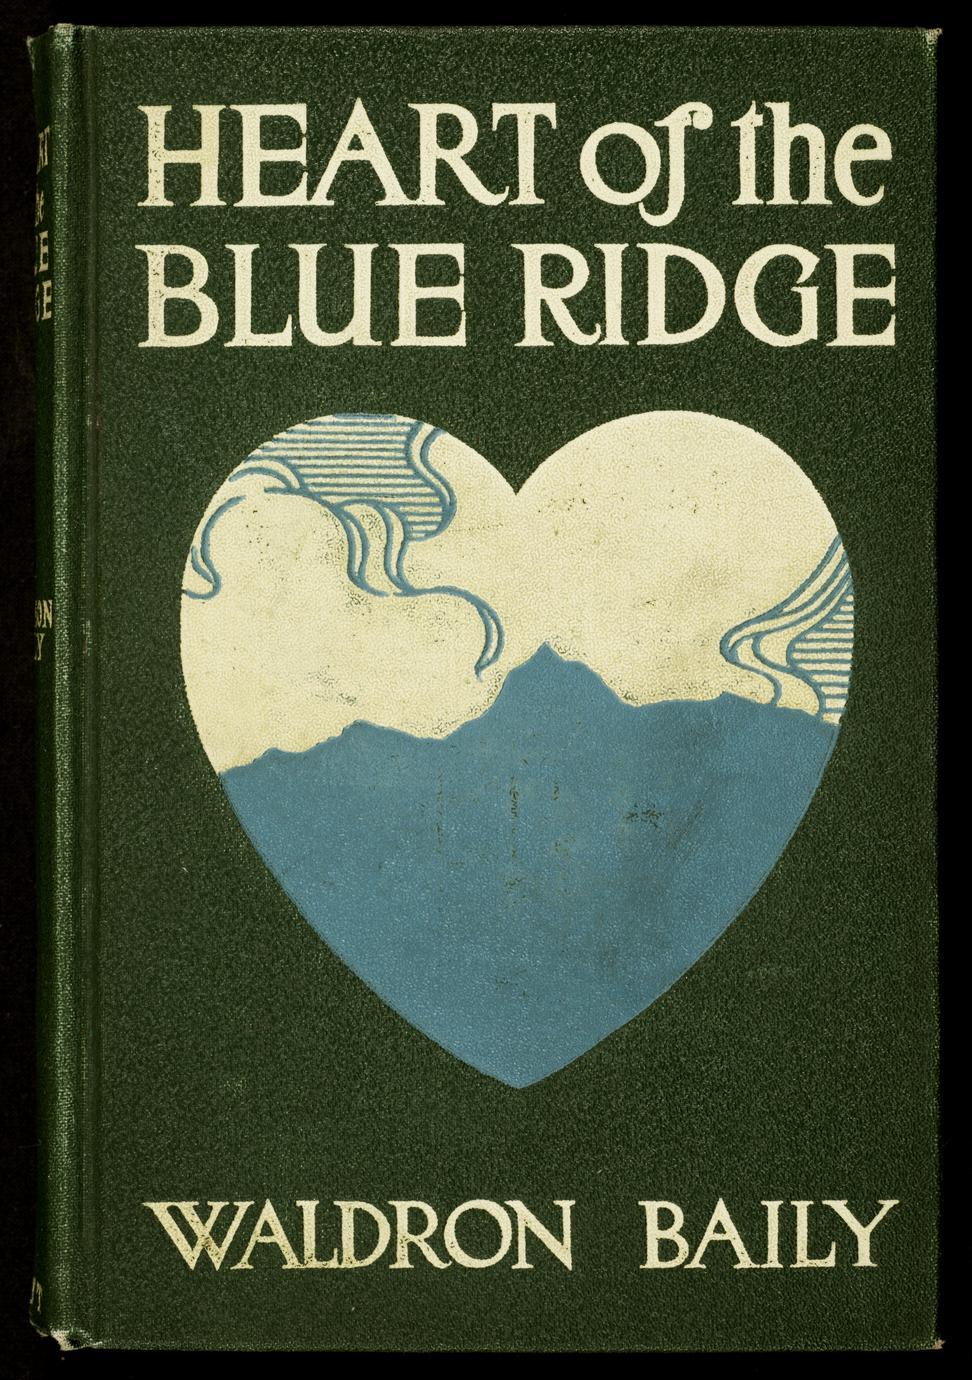 Heart of the Blue Ridge (1 of 2)